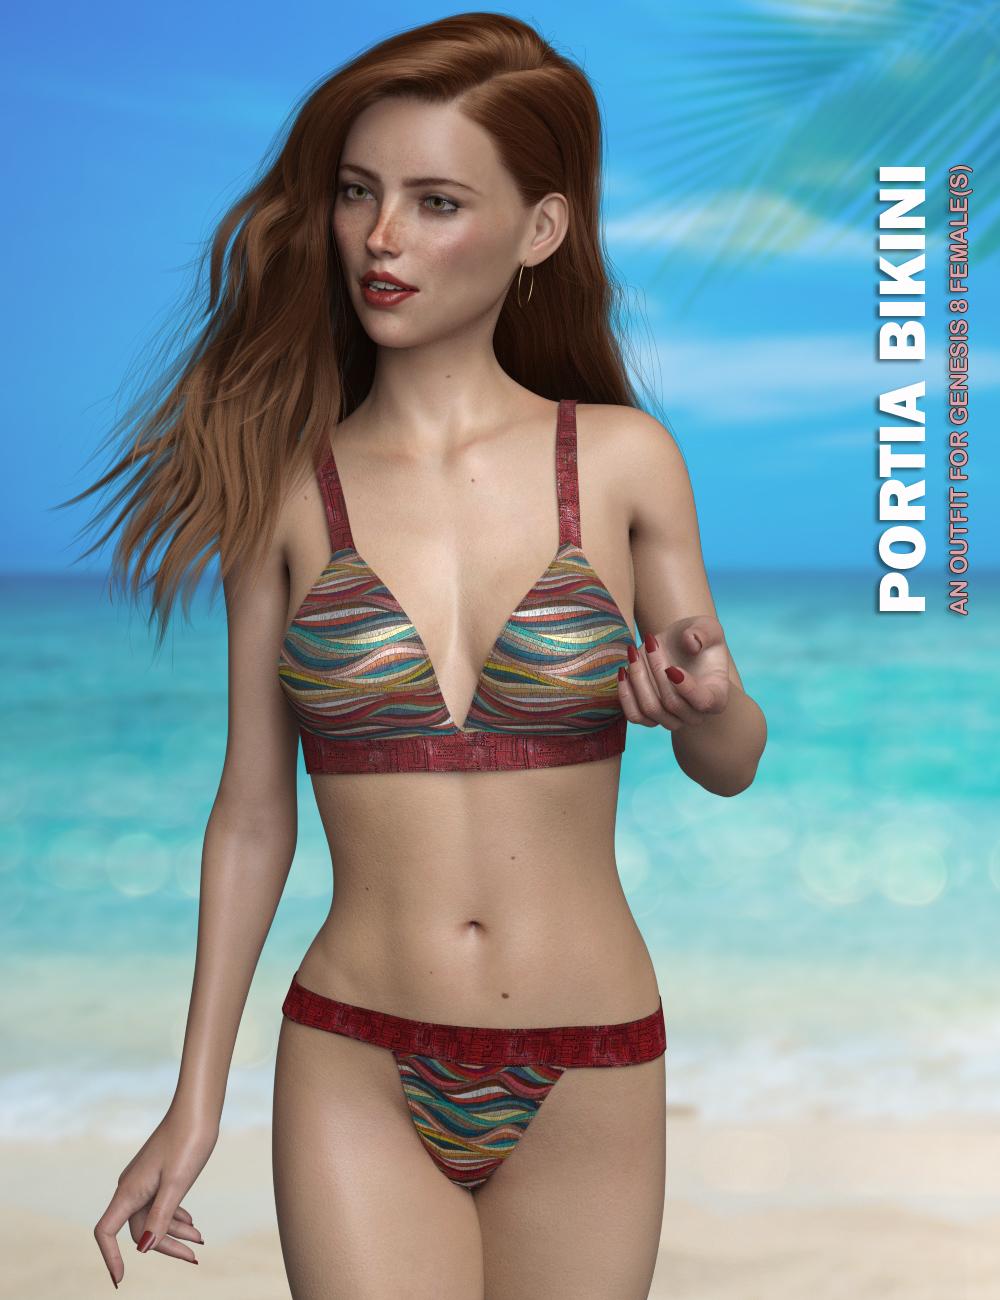 P3D Portia Bikini Outfit for Genesis 8 Female(s) by: P3Design, 3D Models by Daz 3D